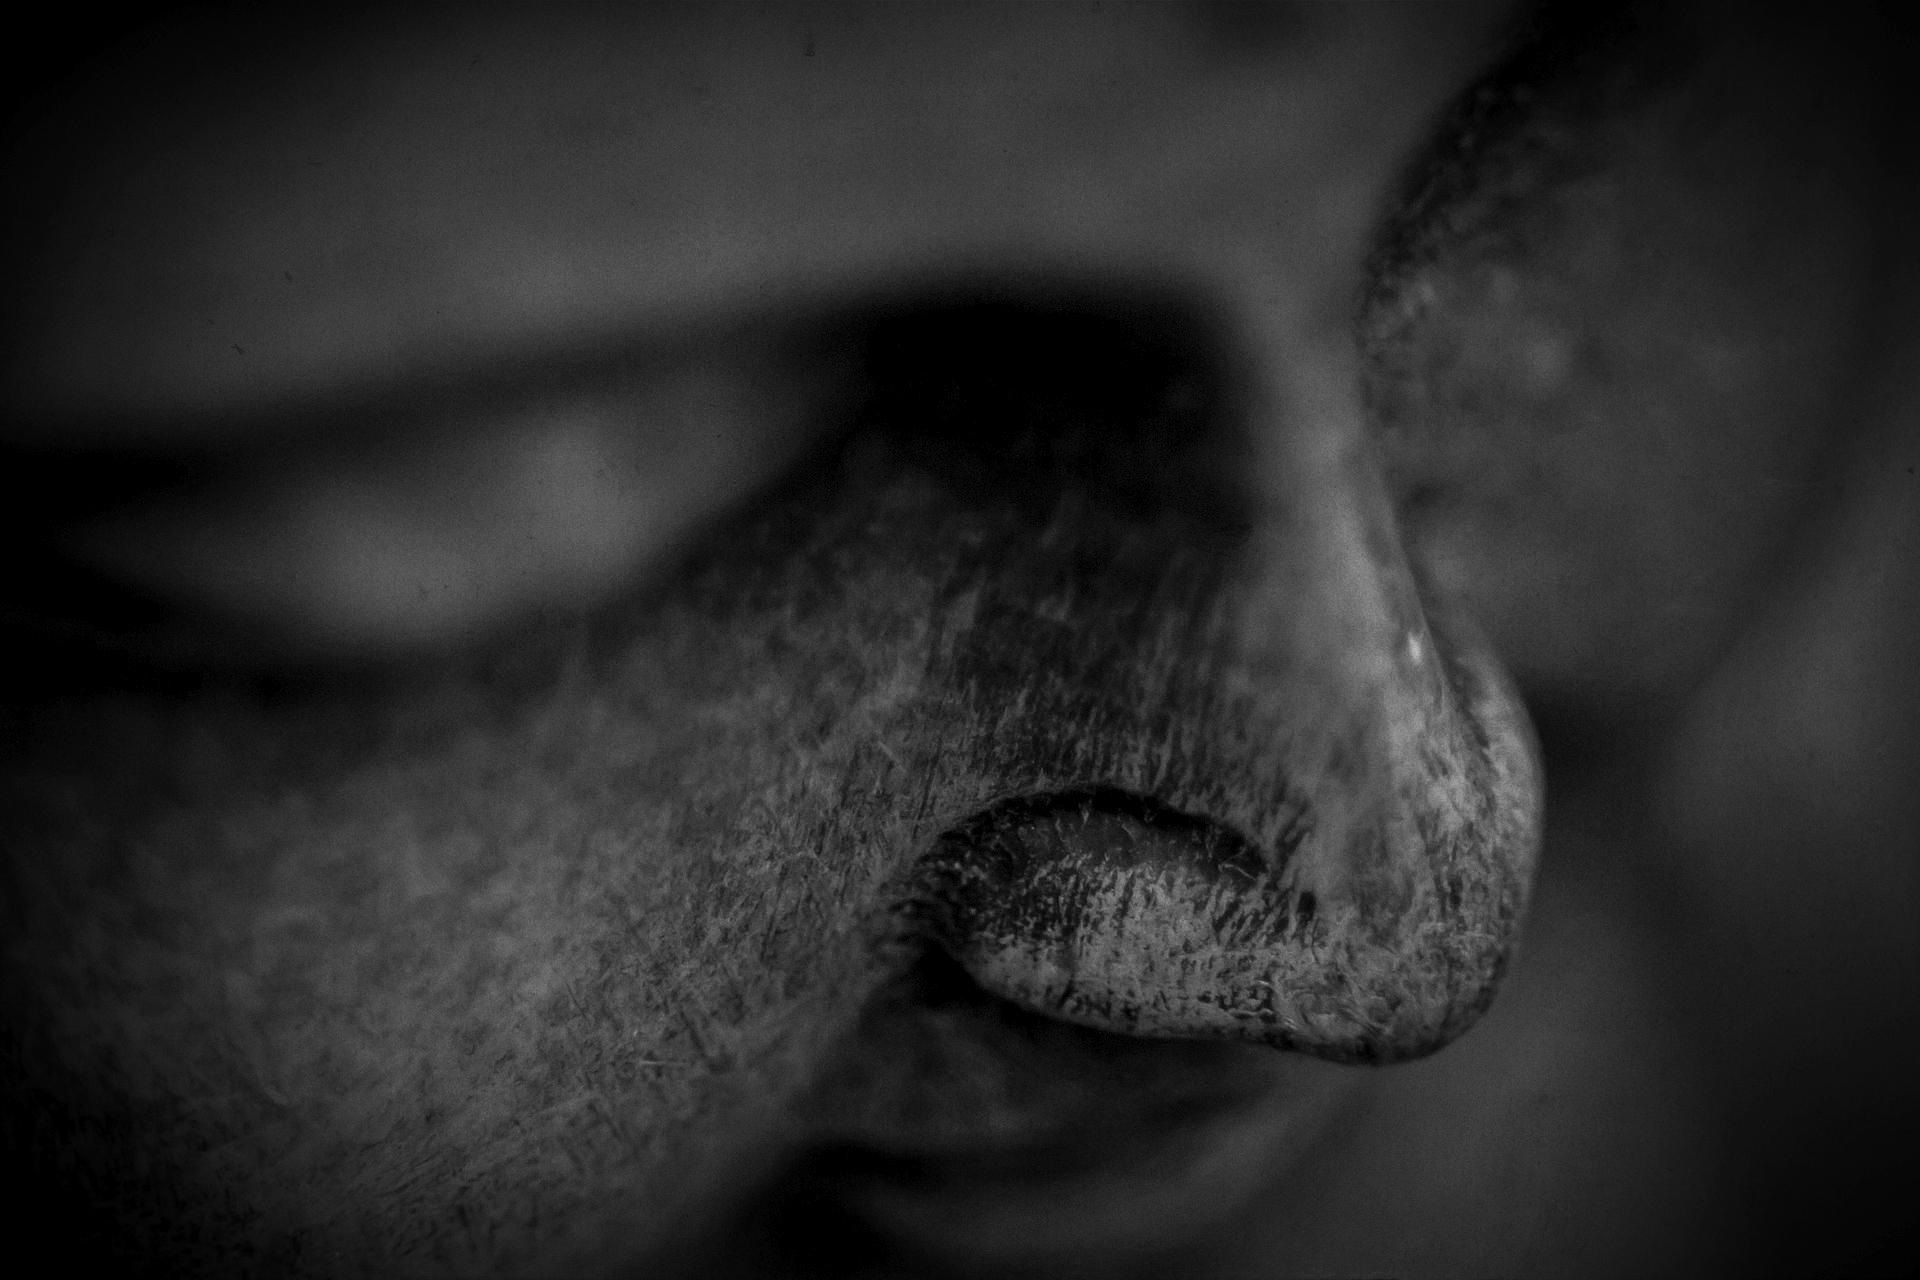 buddha-1279550_1920.jpg